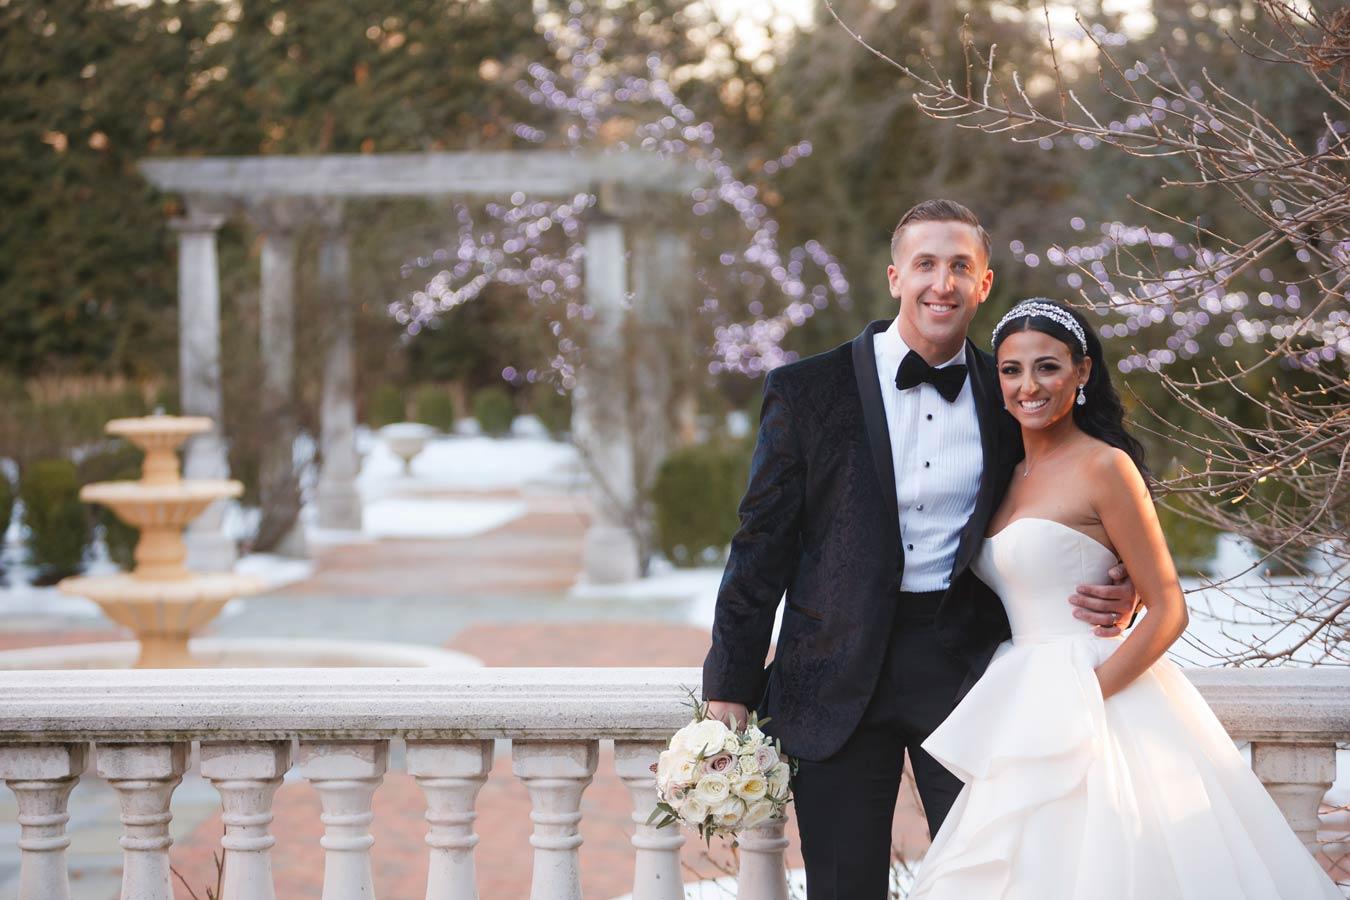 florentine-gardens-wedding-photographer-new-jersey0197.jpg